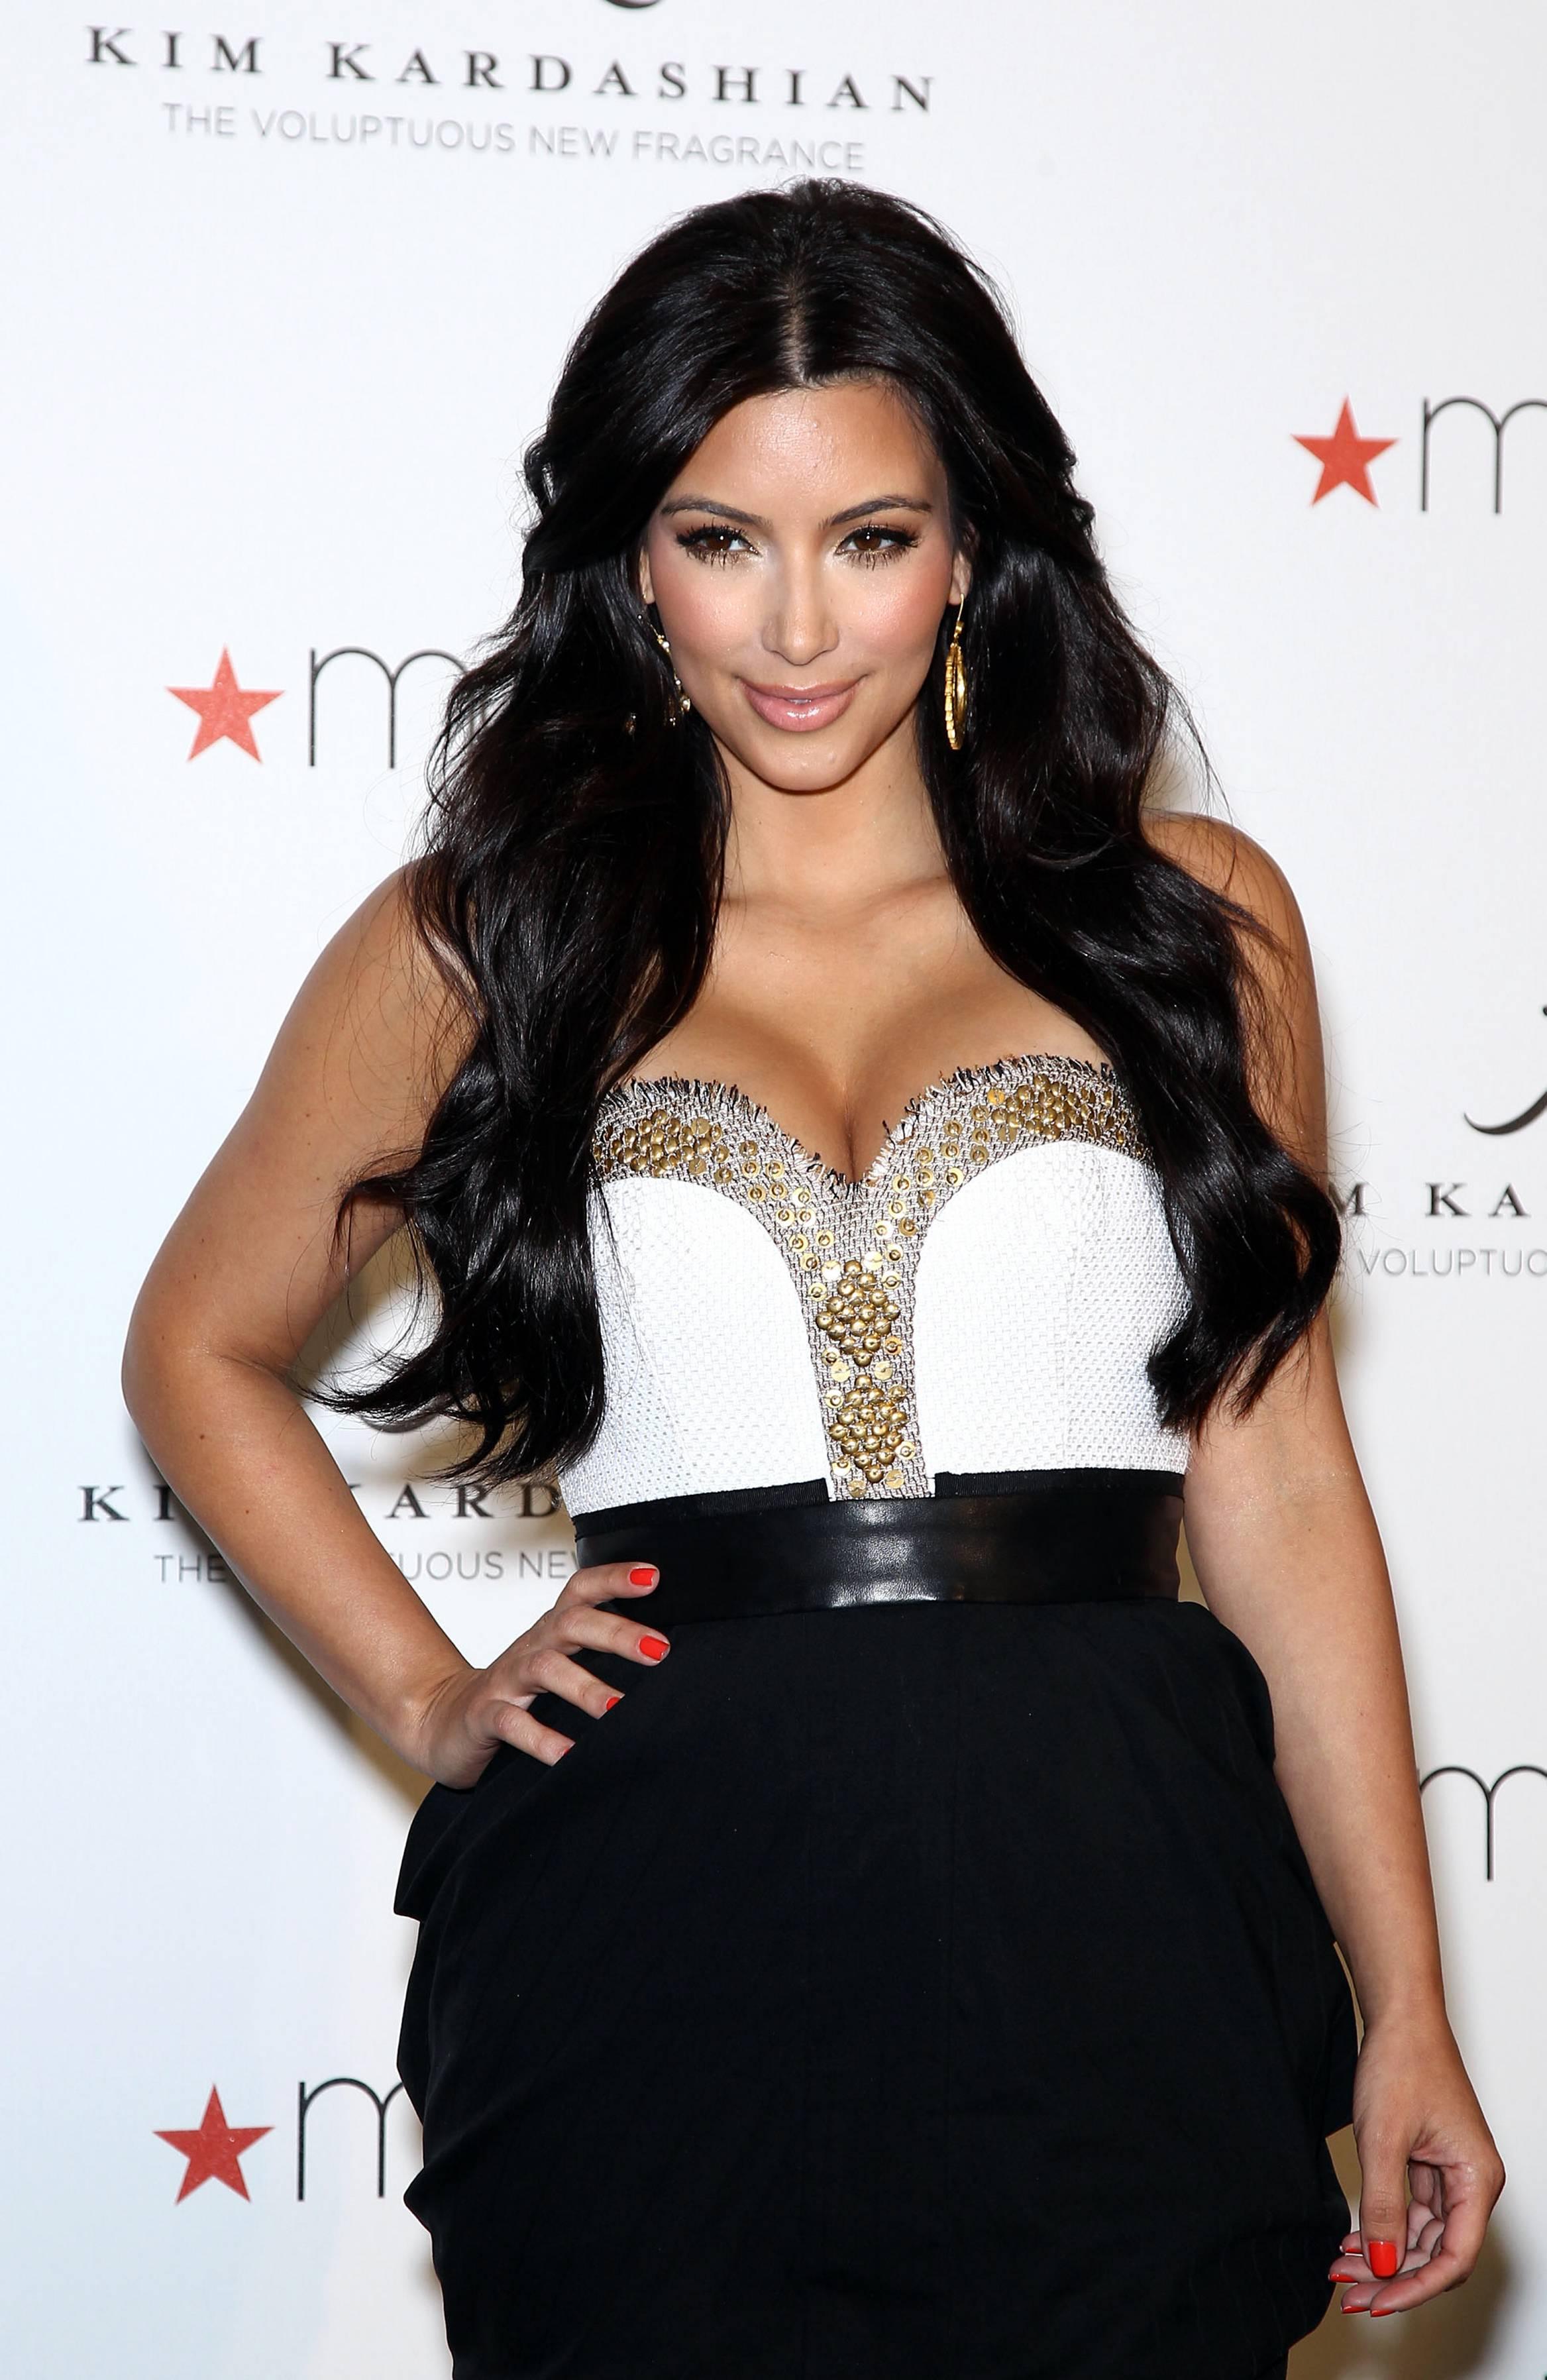 85202_celebrity_paradise.com_Kim_Kardashian_Fragance_33_122_353lo.jpg